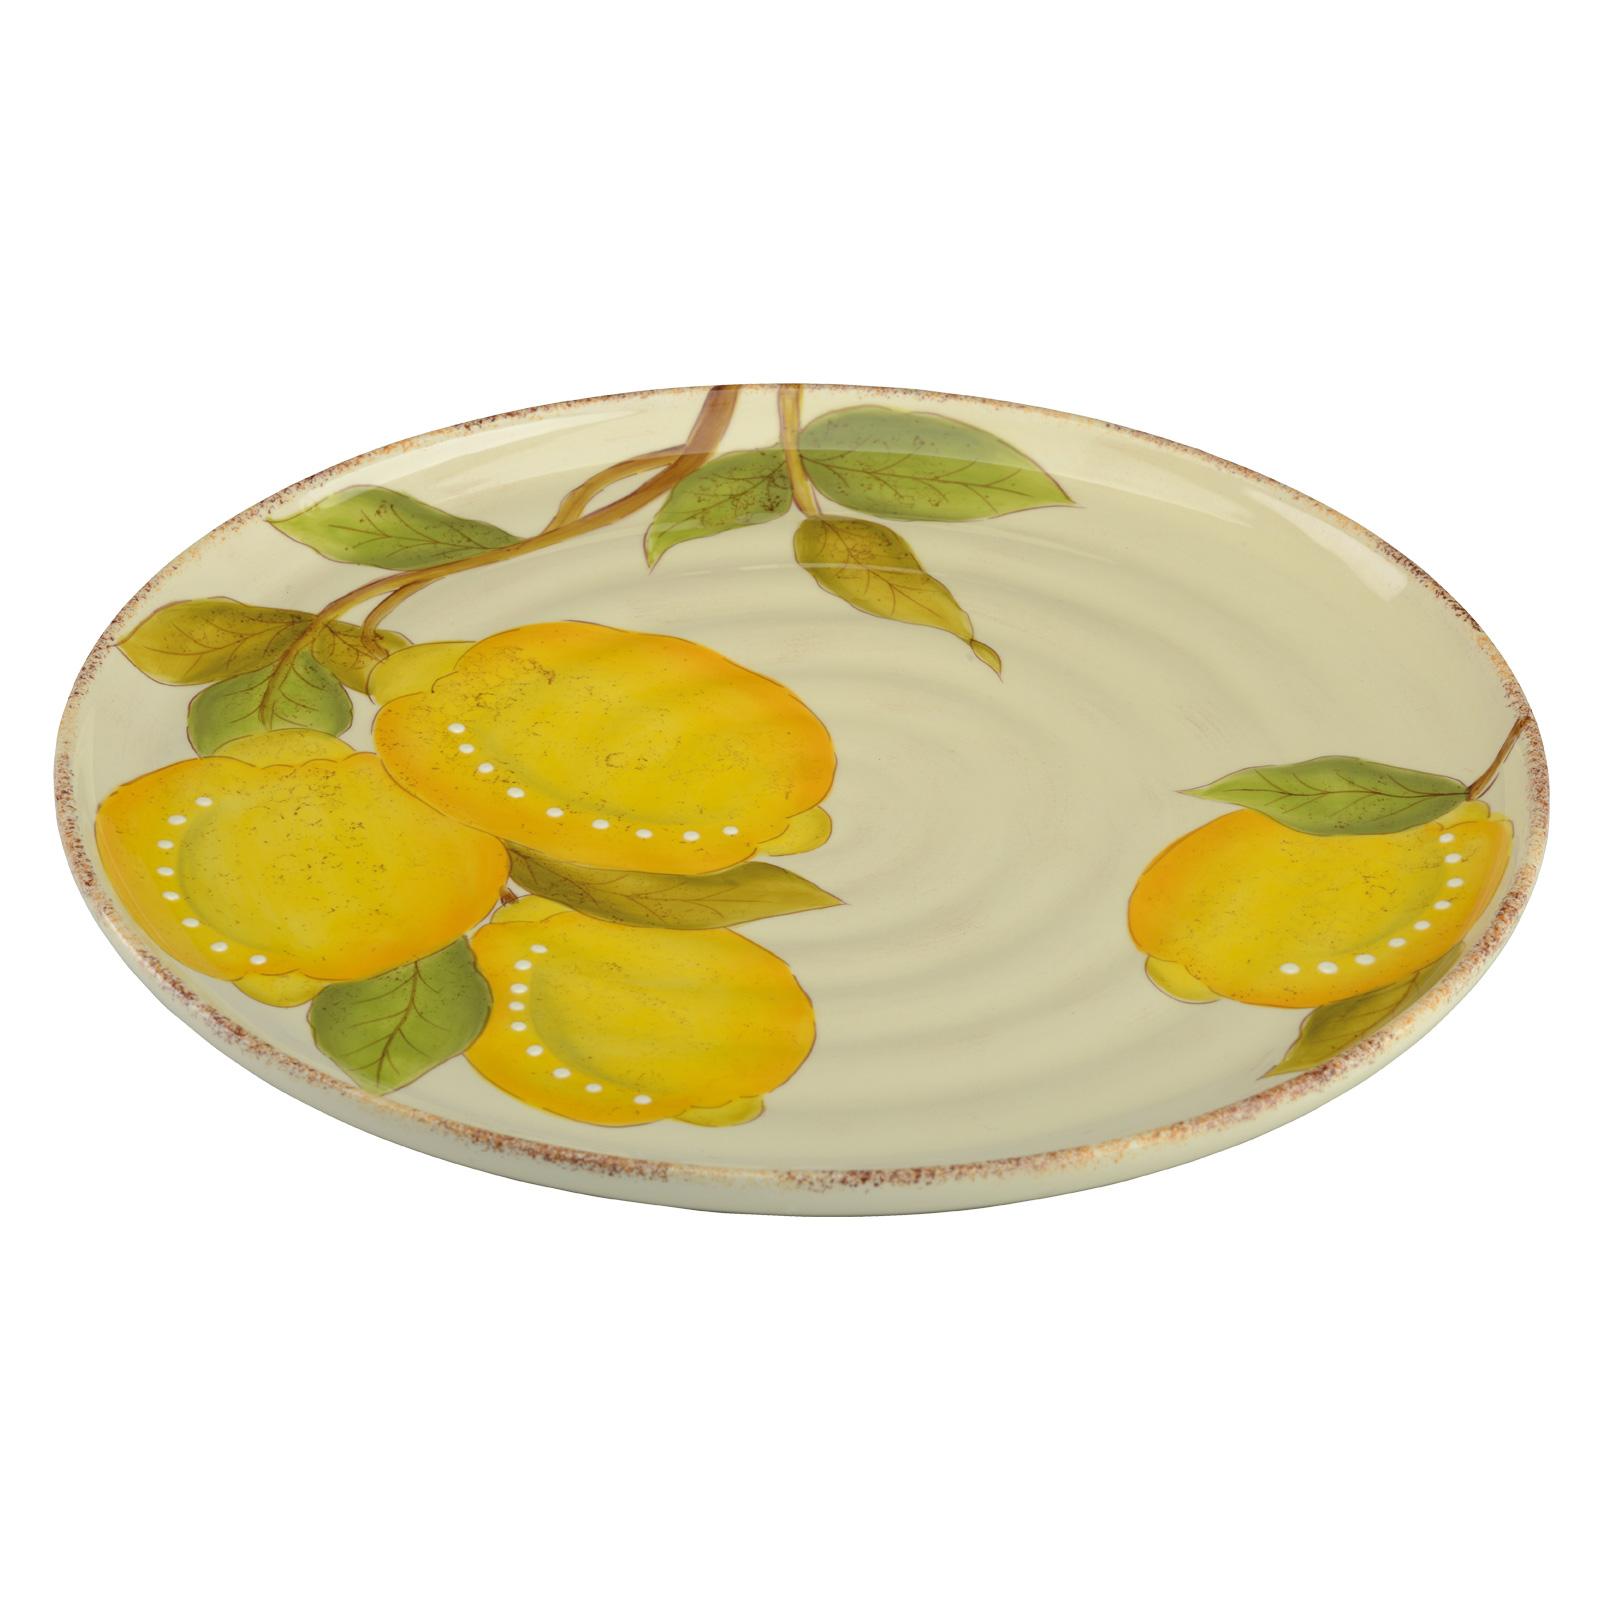 Sorrento Round Serving Platter